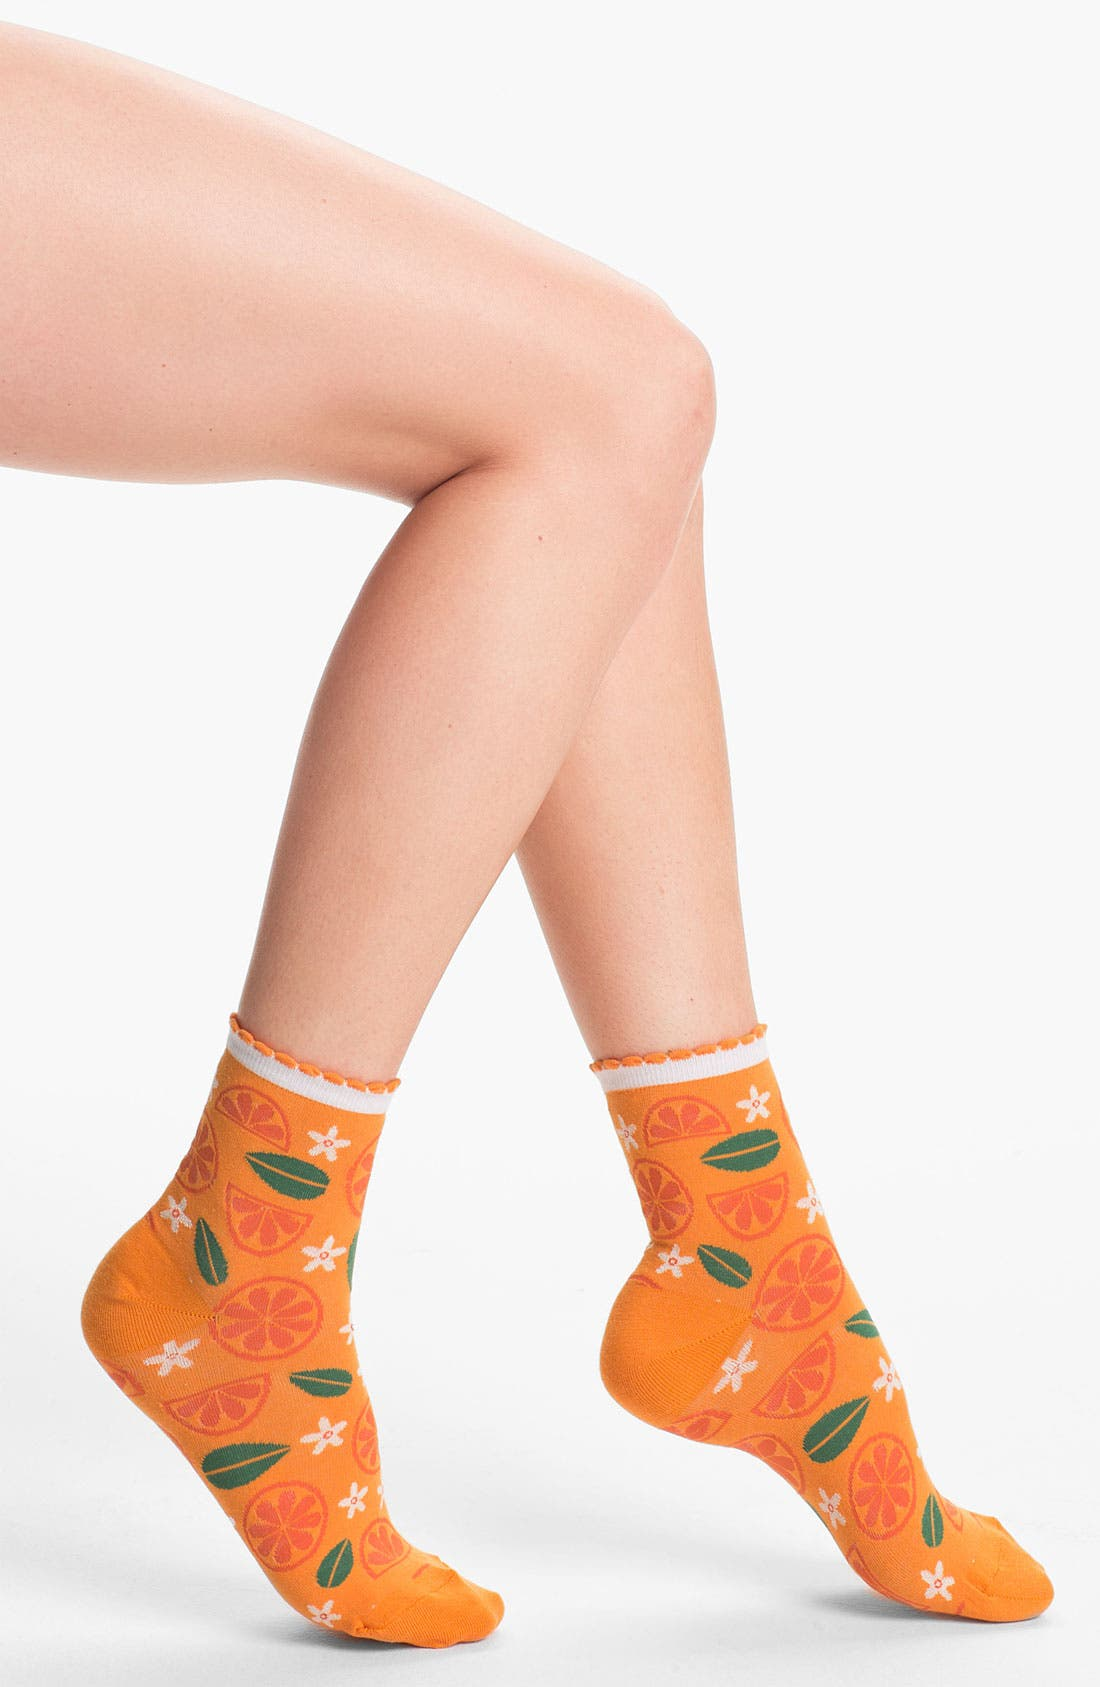 Main Image - Hot Sox 'Citrus' Scallop Cuff Socks